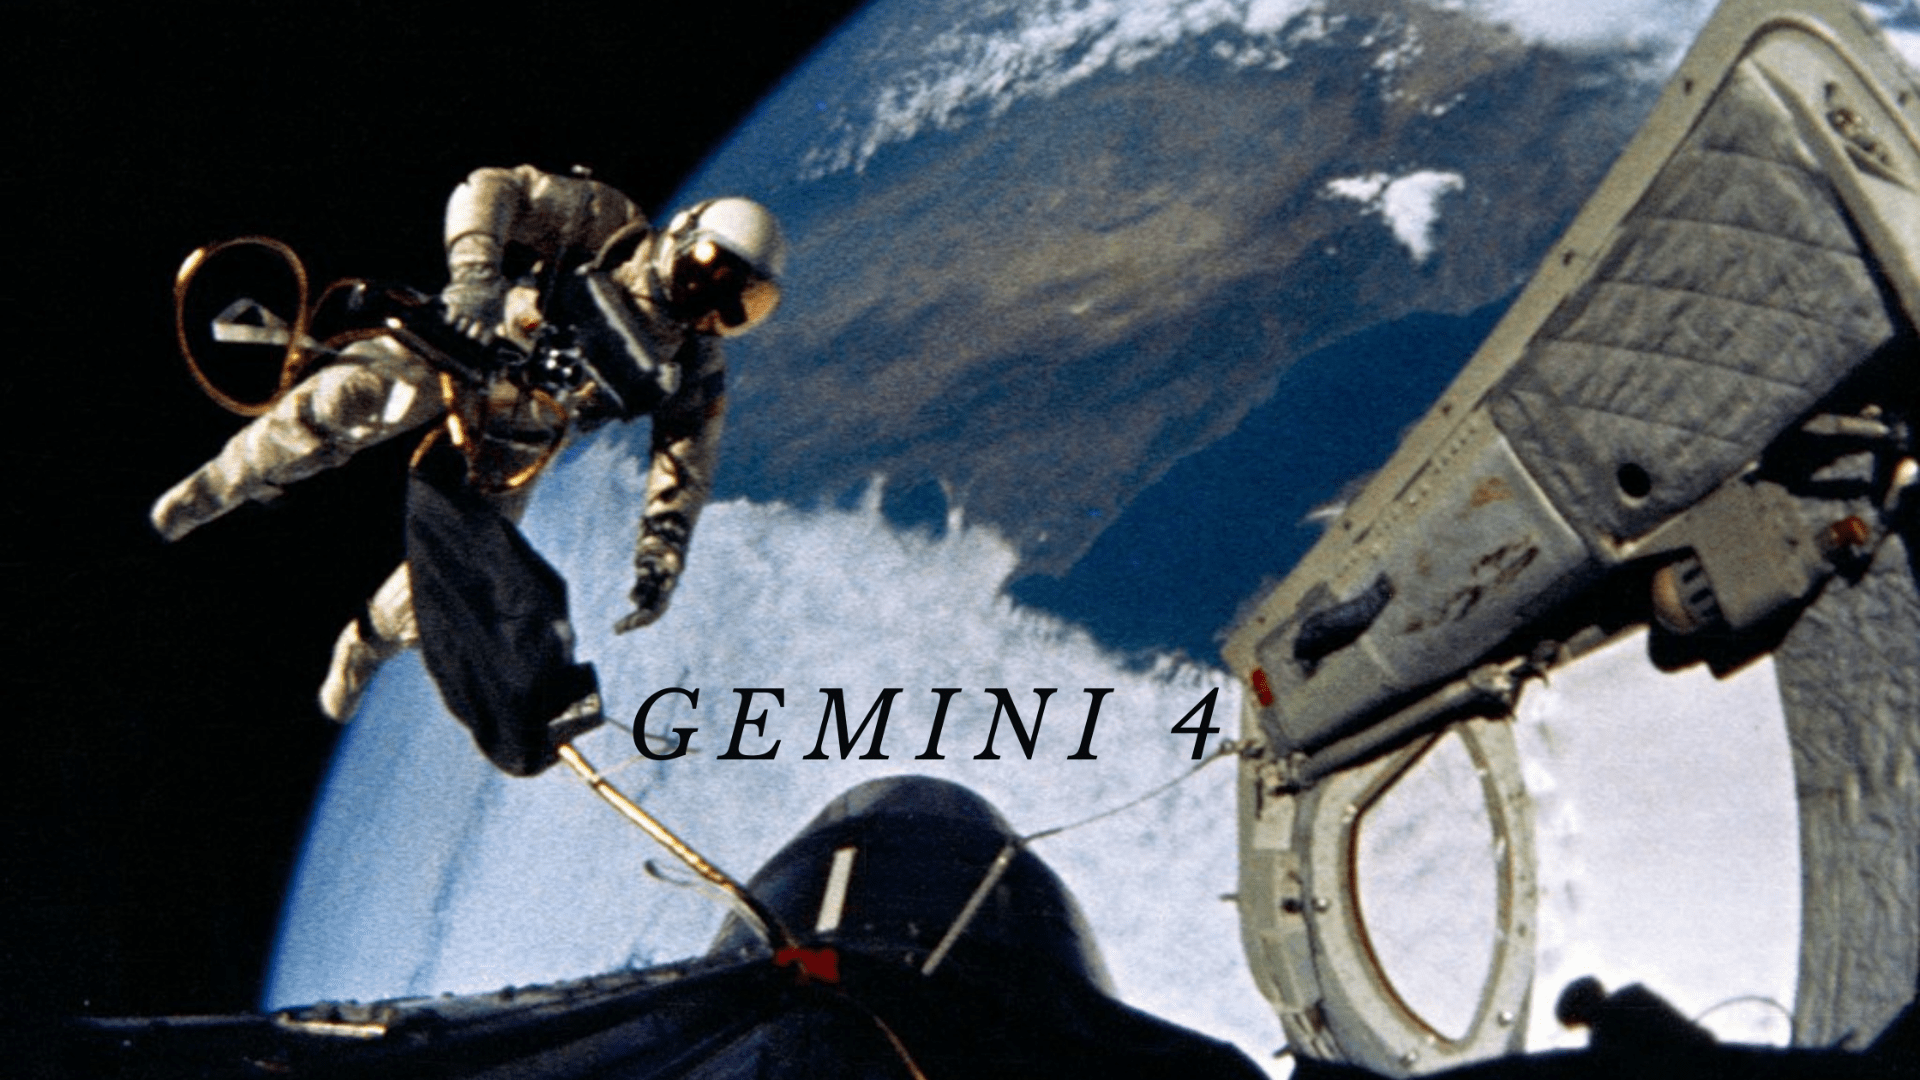 Gemini 4 header